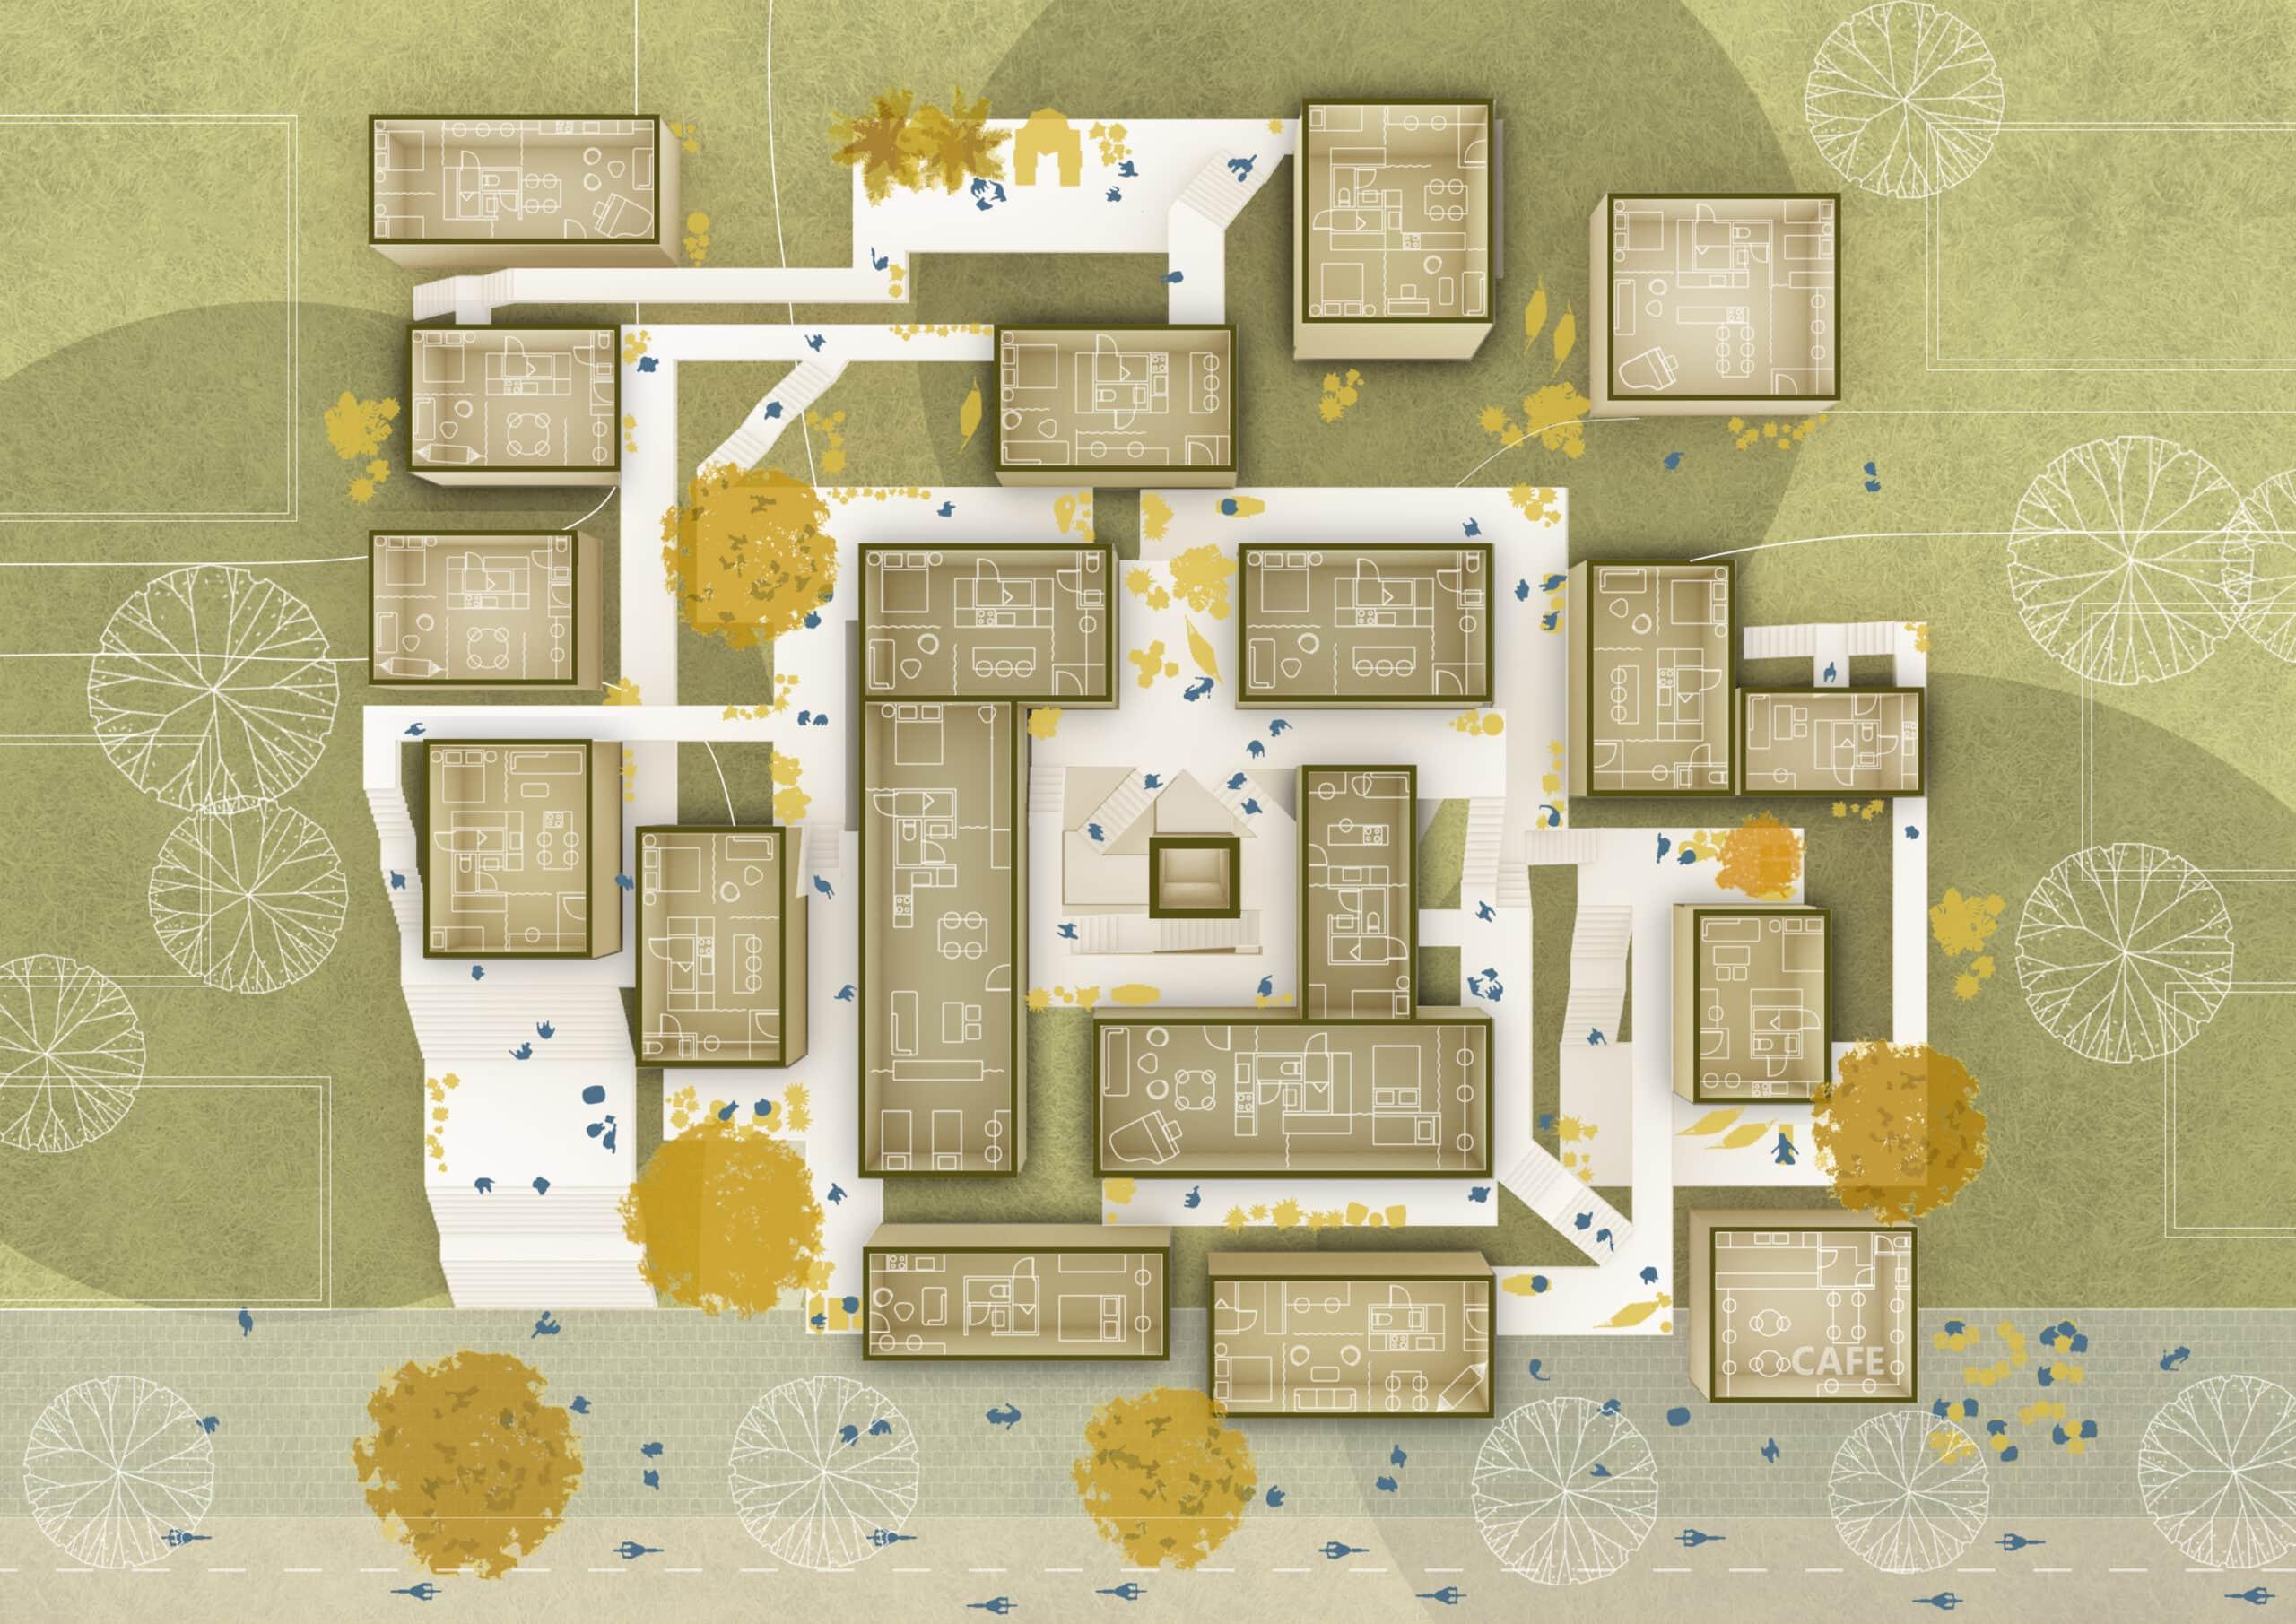 18155_Cohabitating Corridors_Concept